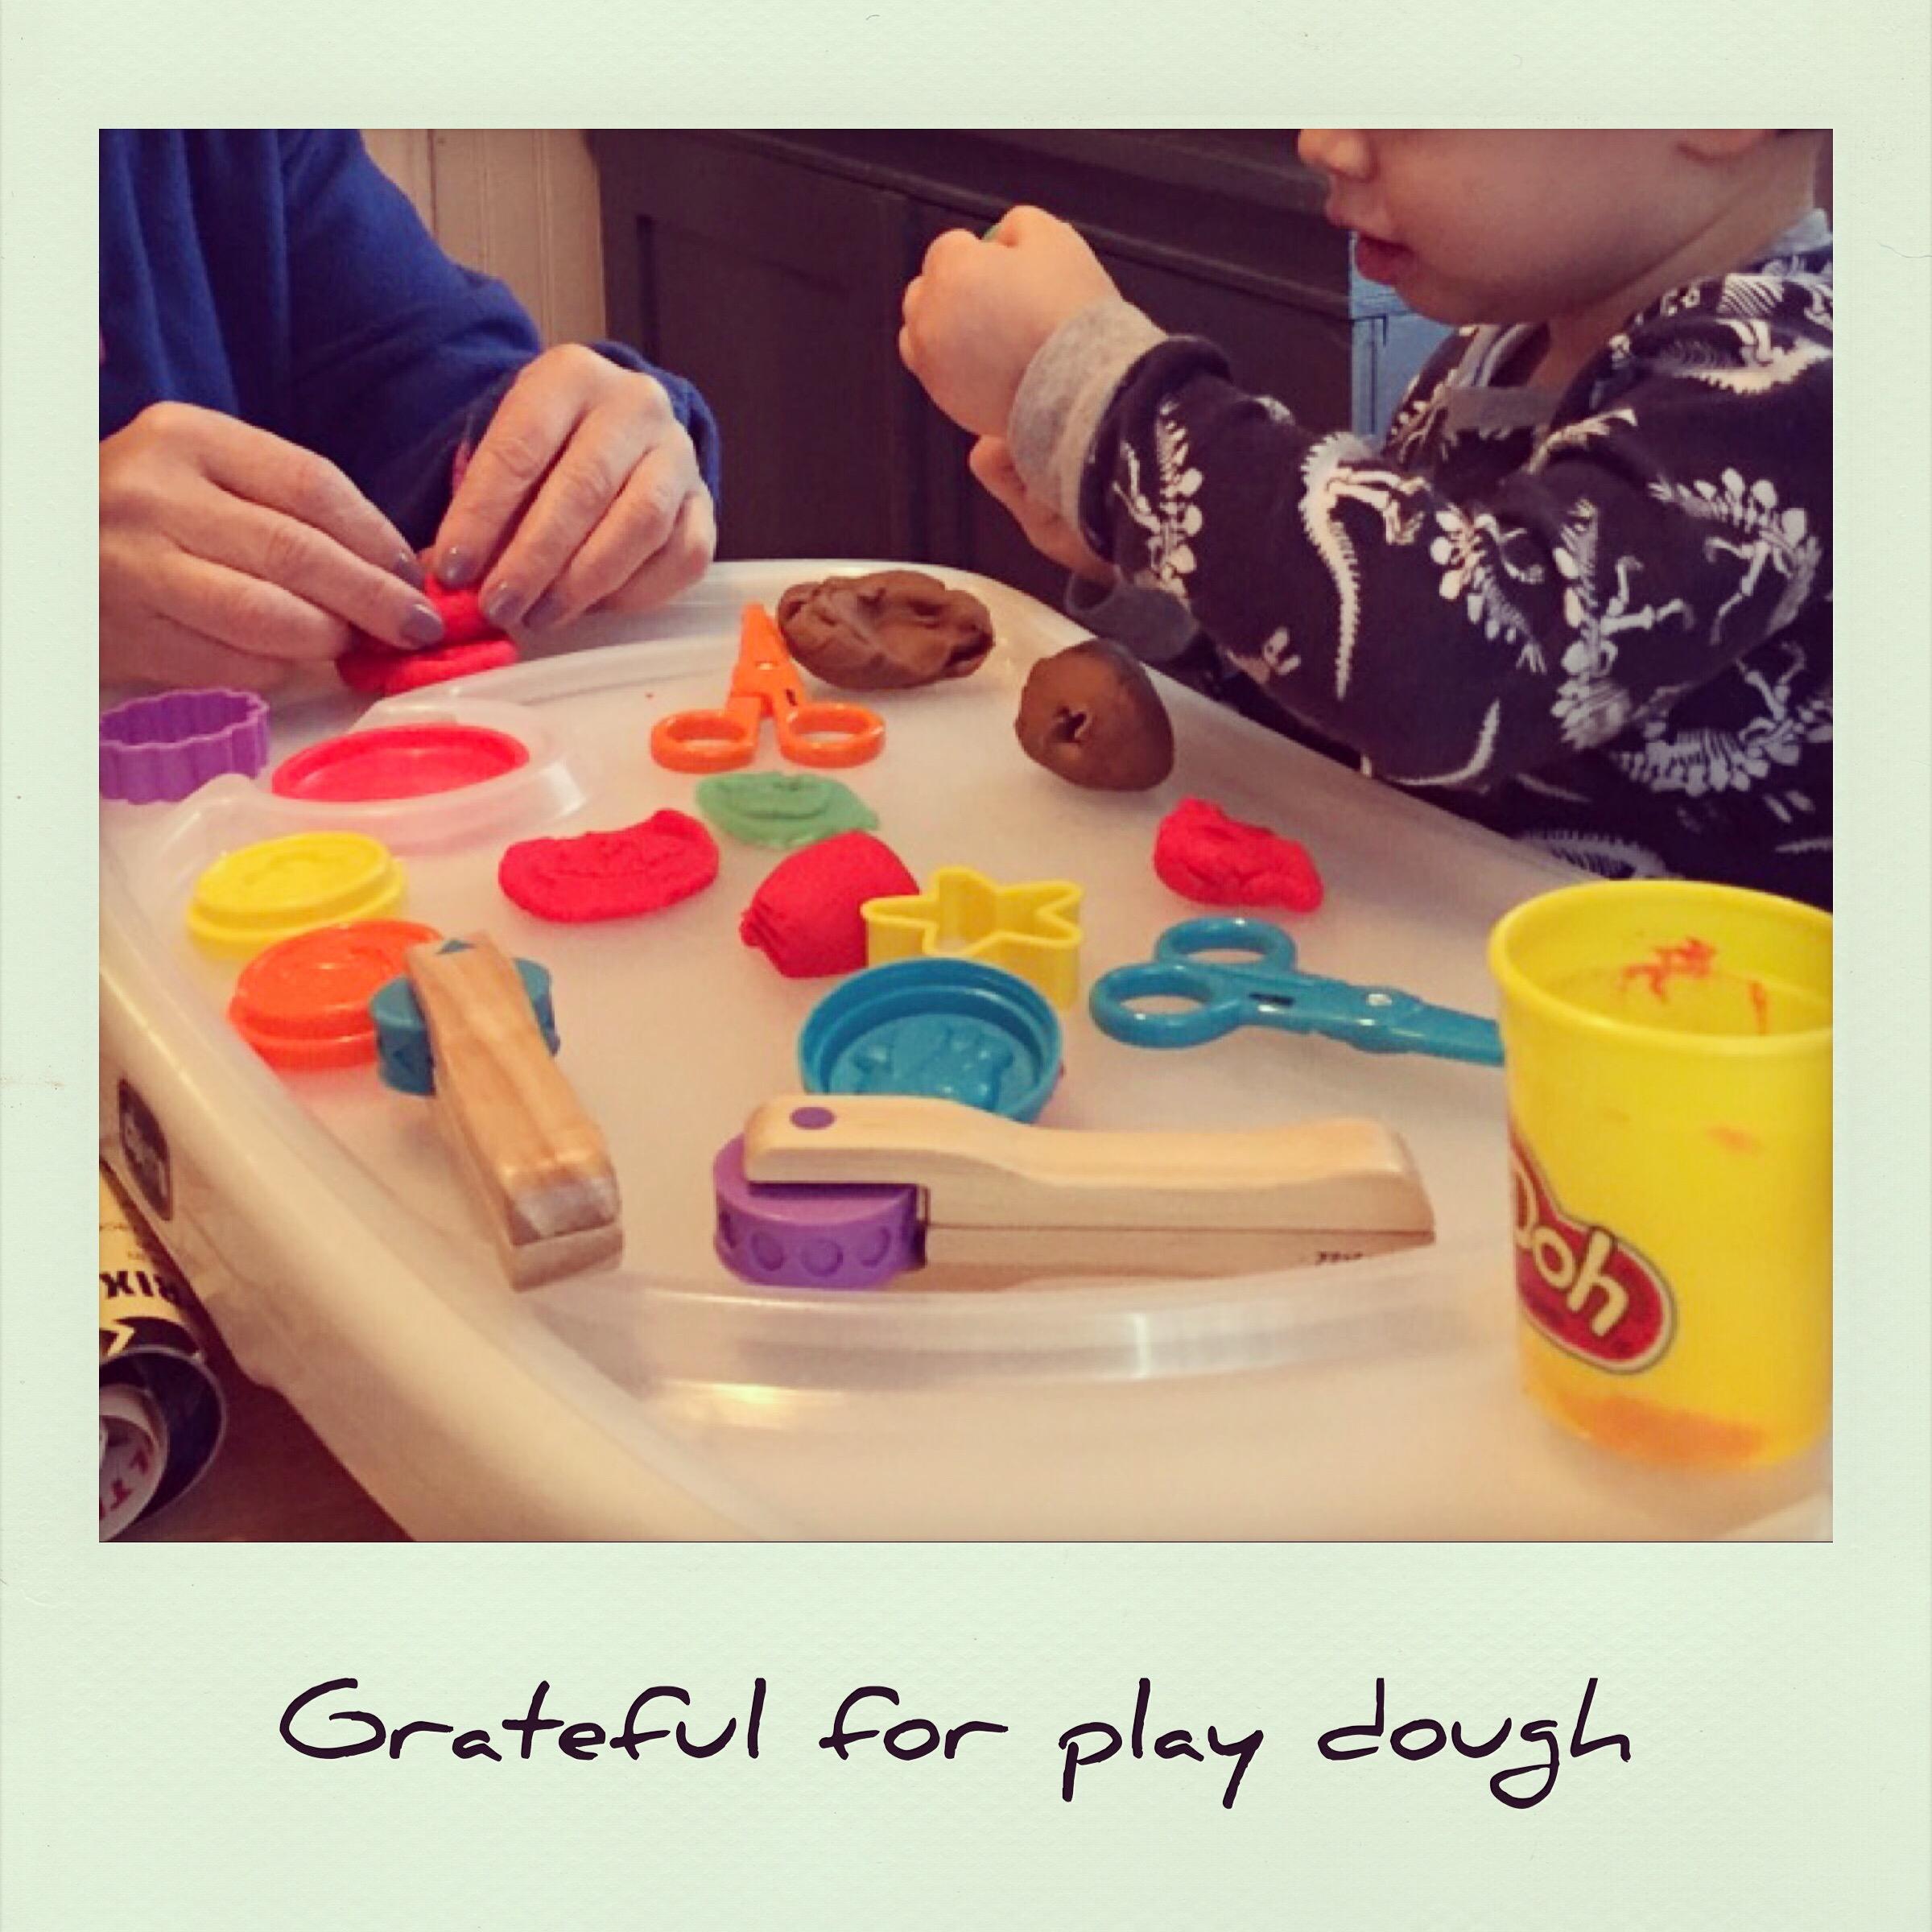 Grateful for play dough